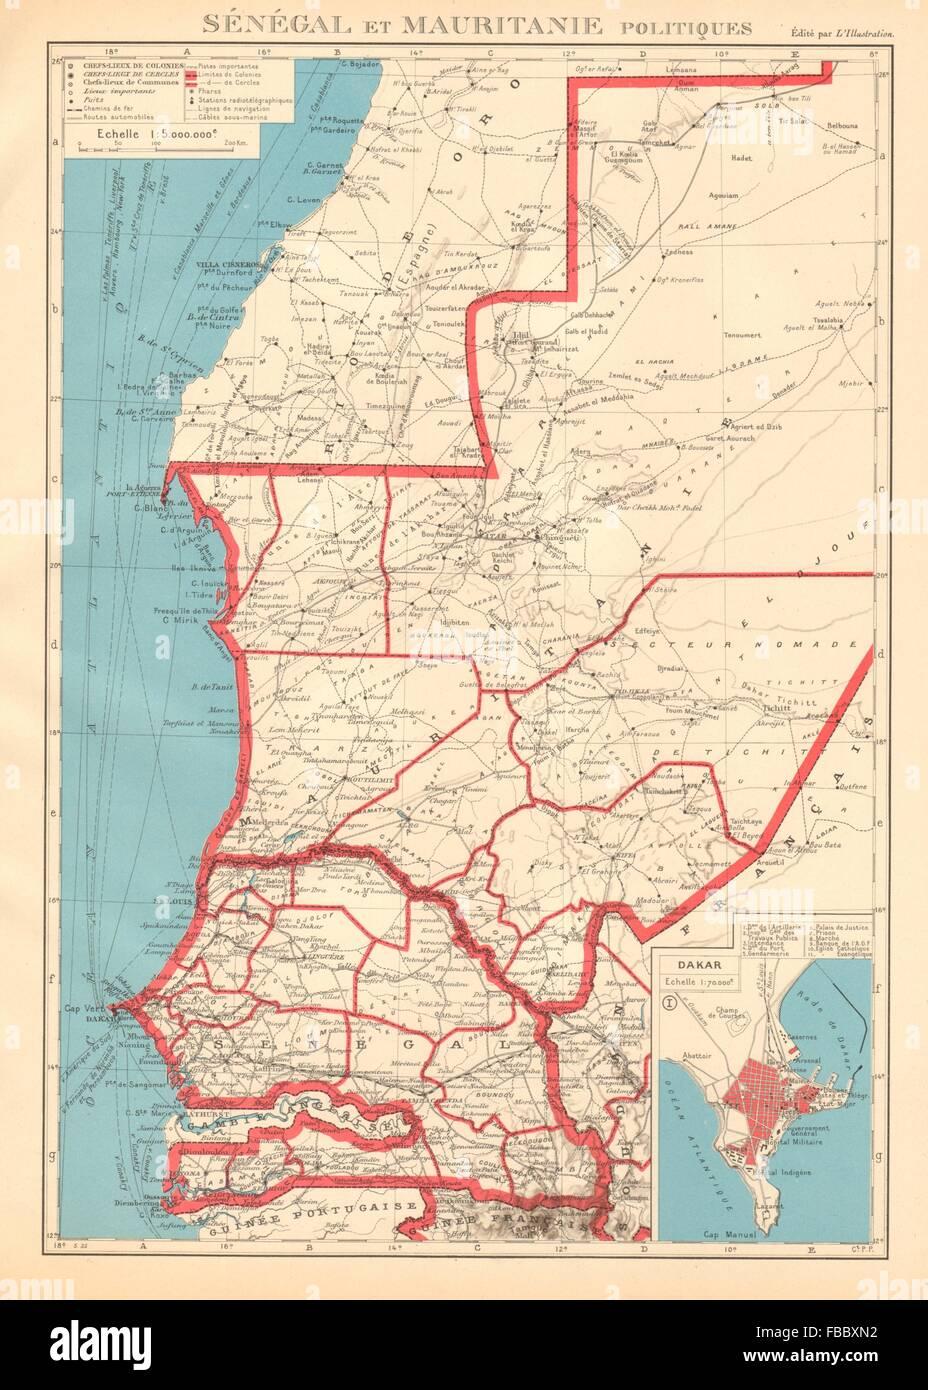 Senegal On Africa Map.French West Africa Senegal Mauritanie Mauritania Dakar Plan